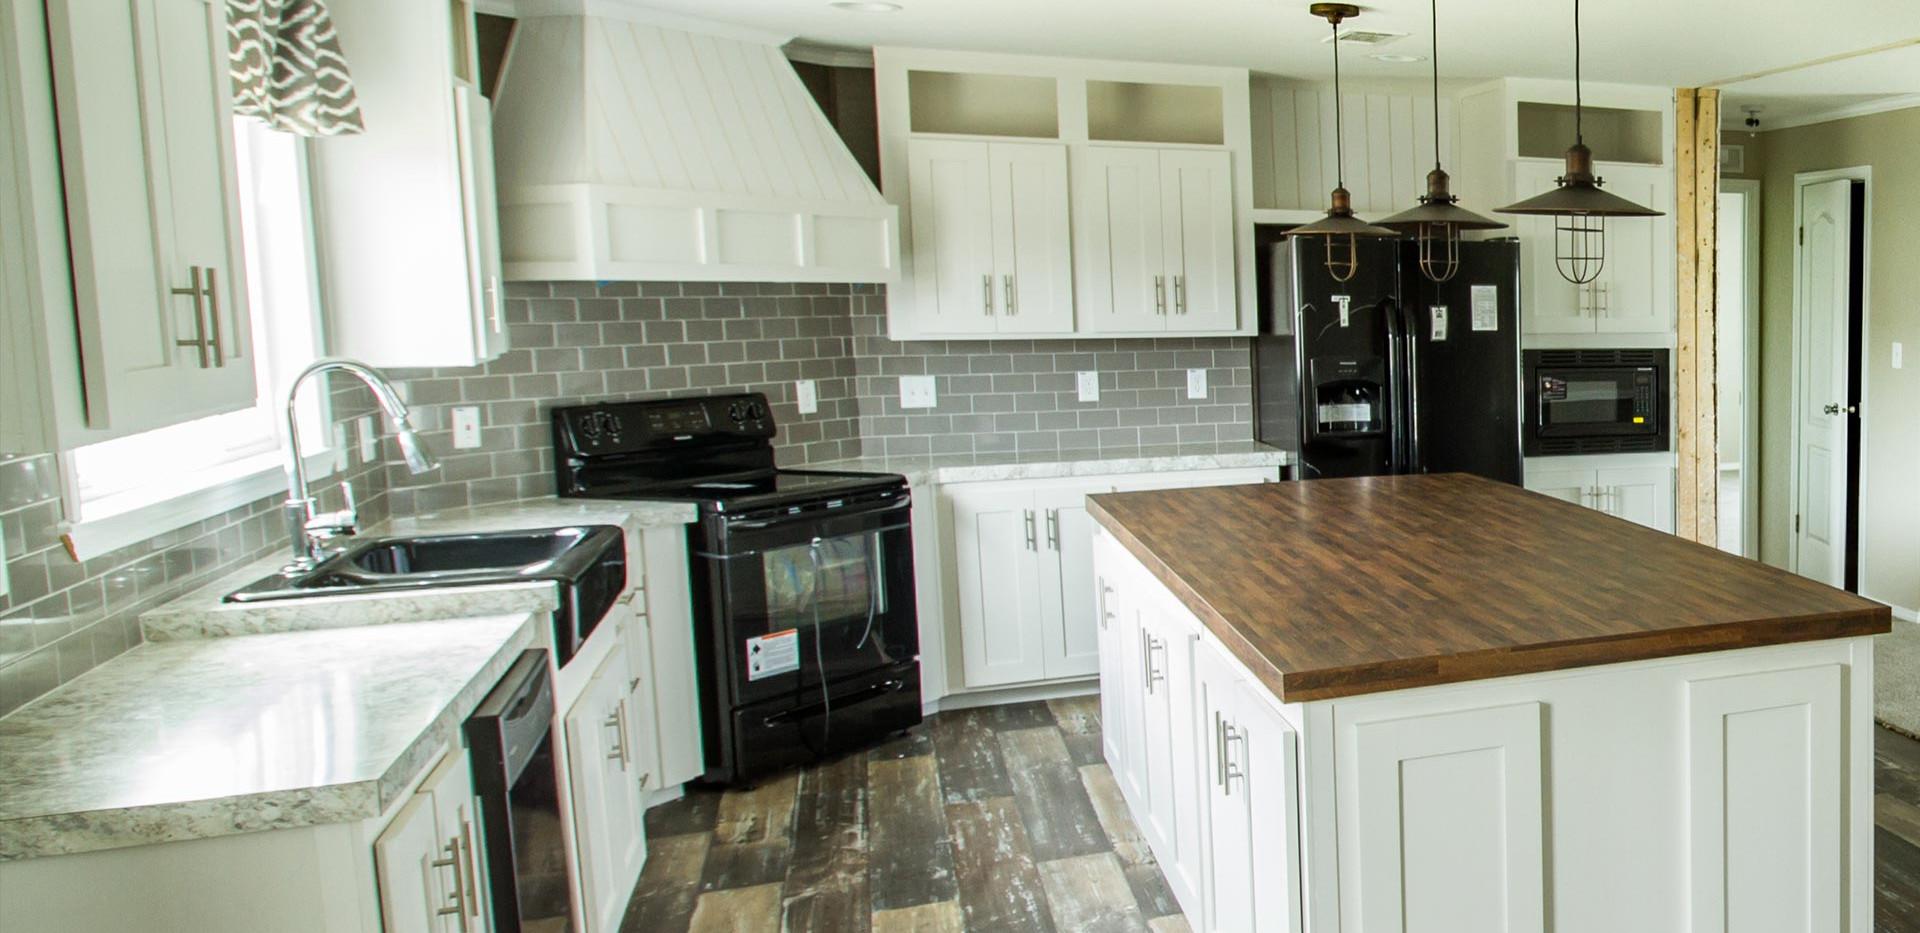 Fossil-Creek-The-Drake-kitchen-4.jpg